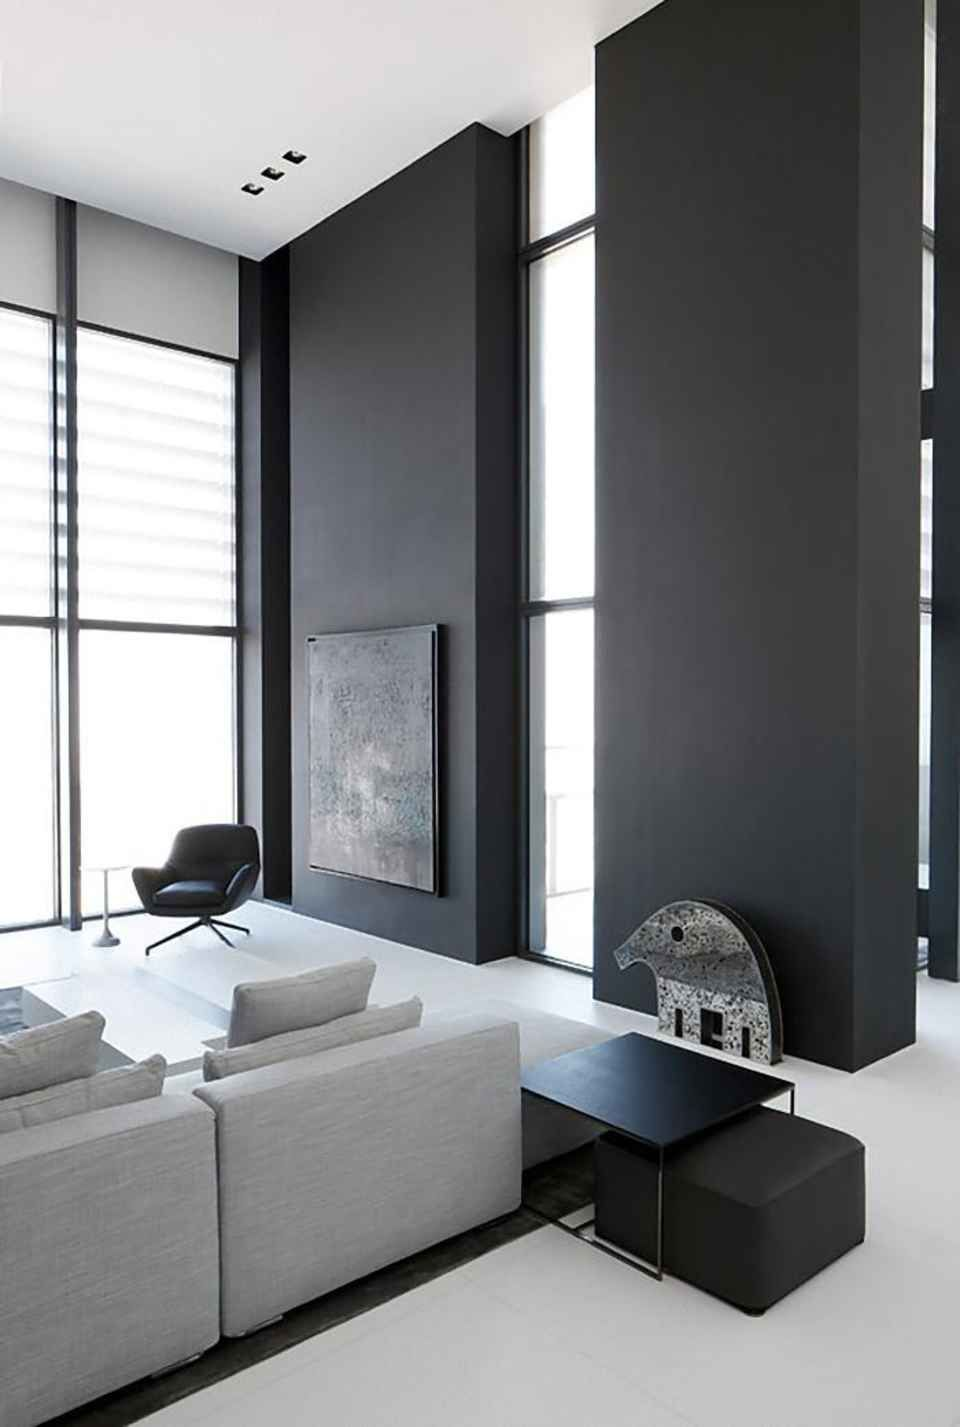 20 Examples Of Minimal Interior Design #22 - UltraLinx